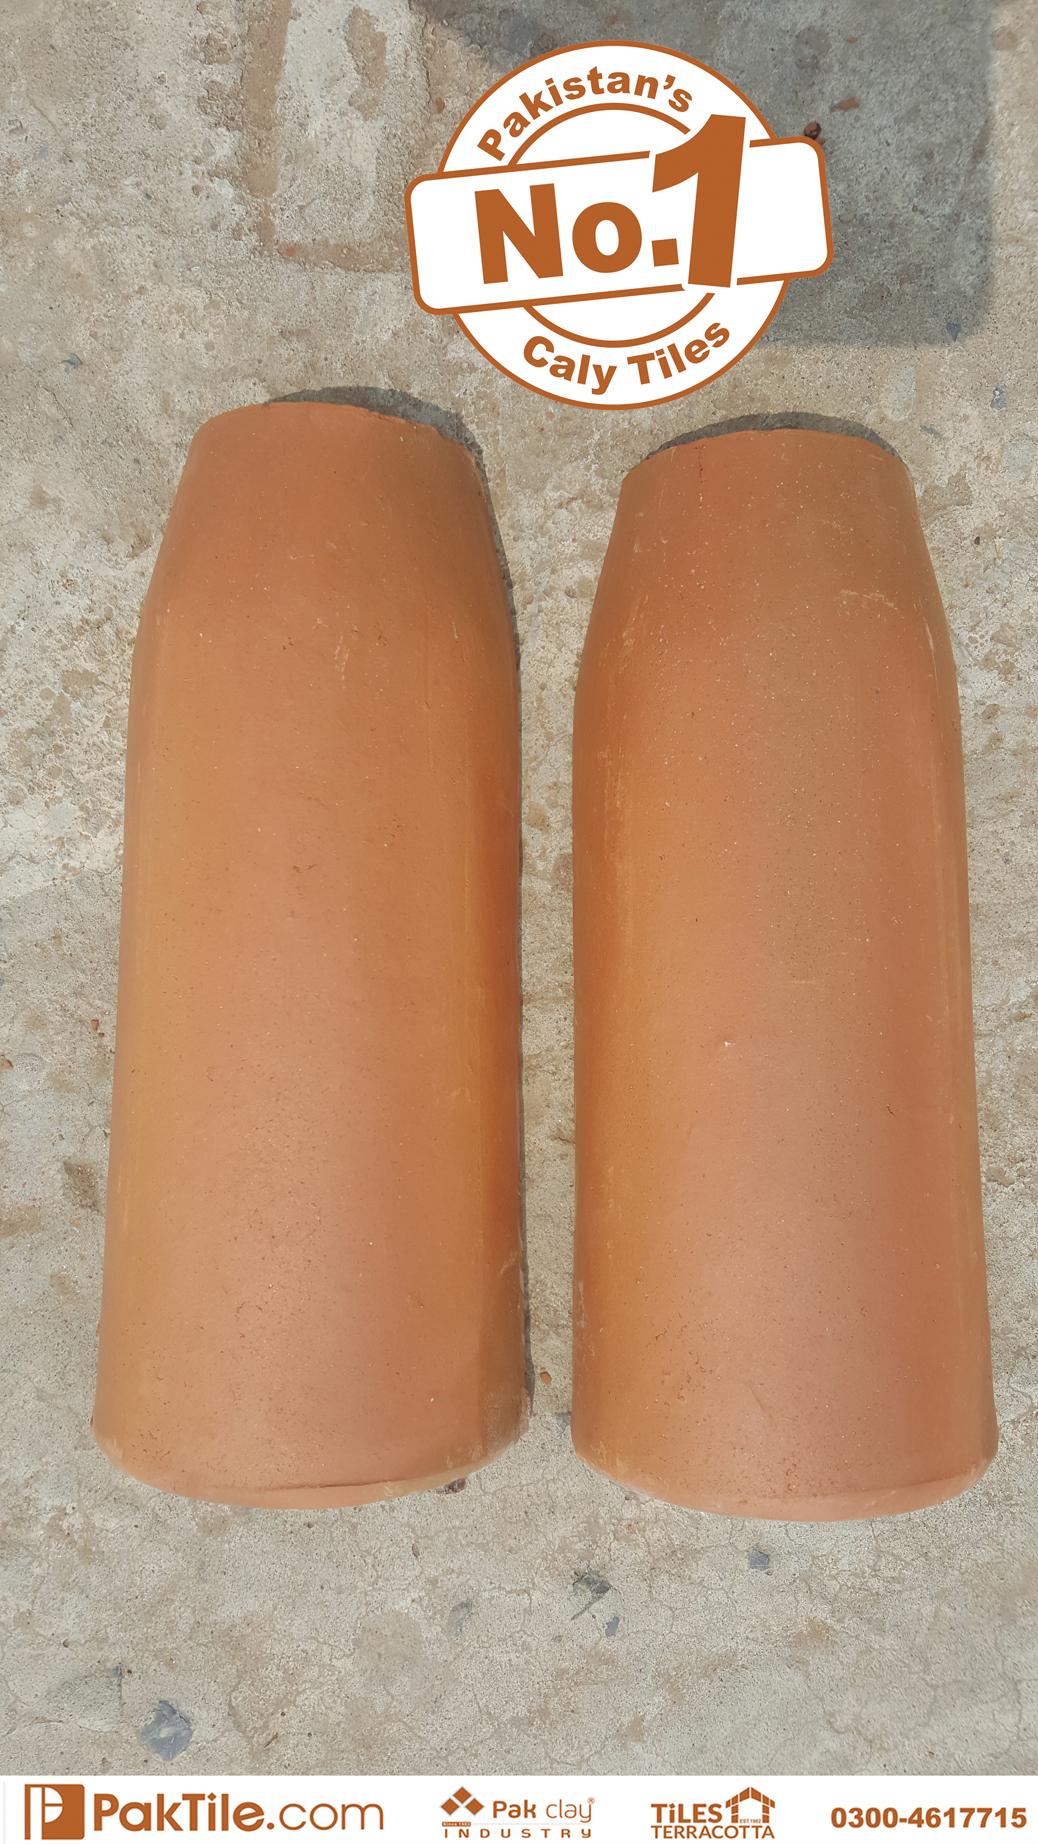 1 Pak clay unglazed khaprail tiles sheets house roof tiles design wooden tiles price in pakistan